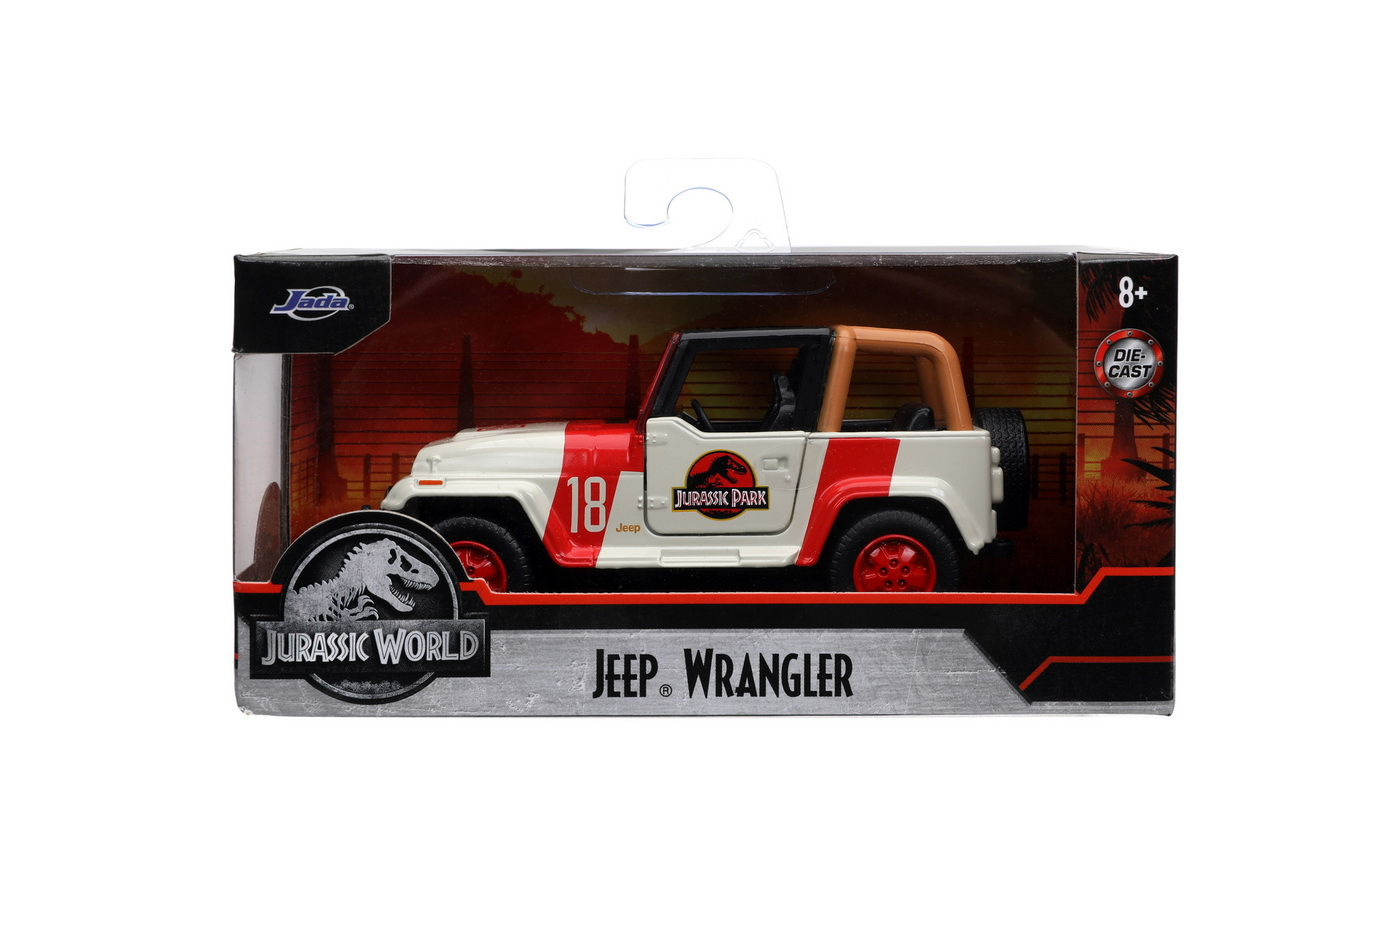 Jurassik Park Masinuta Metalica Jeep Wrangler Scara 1:32